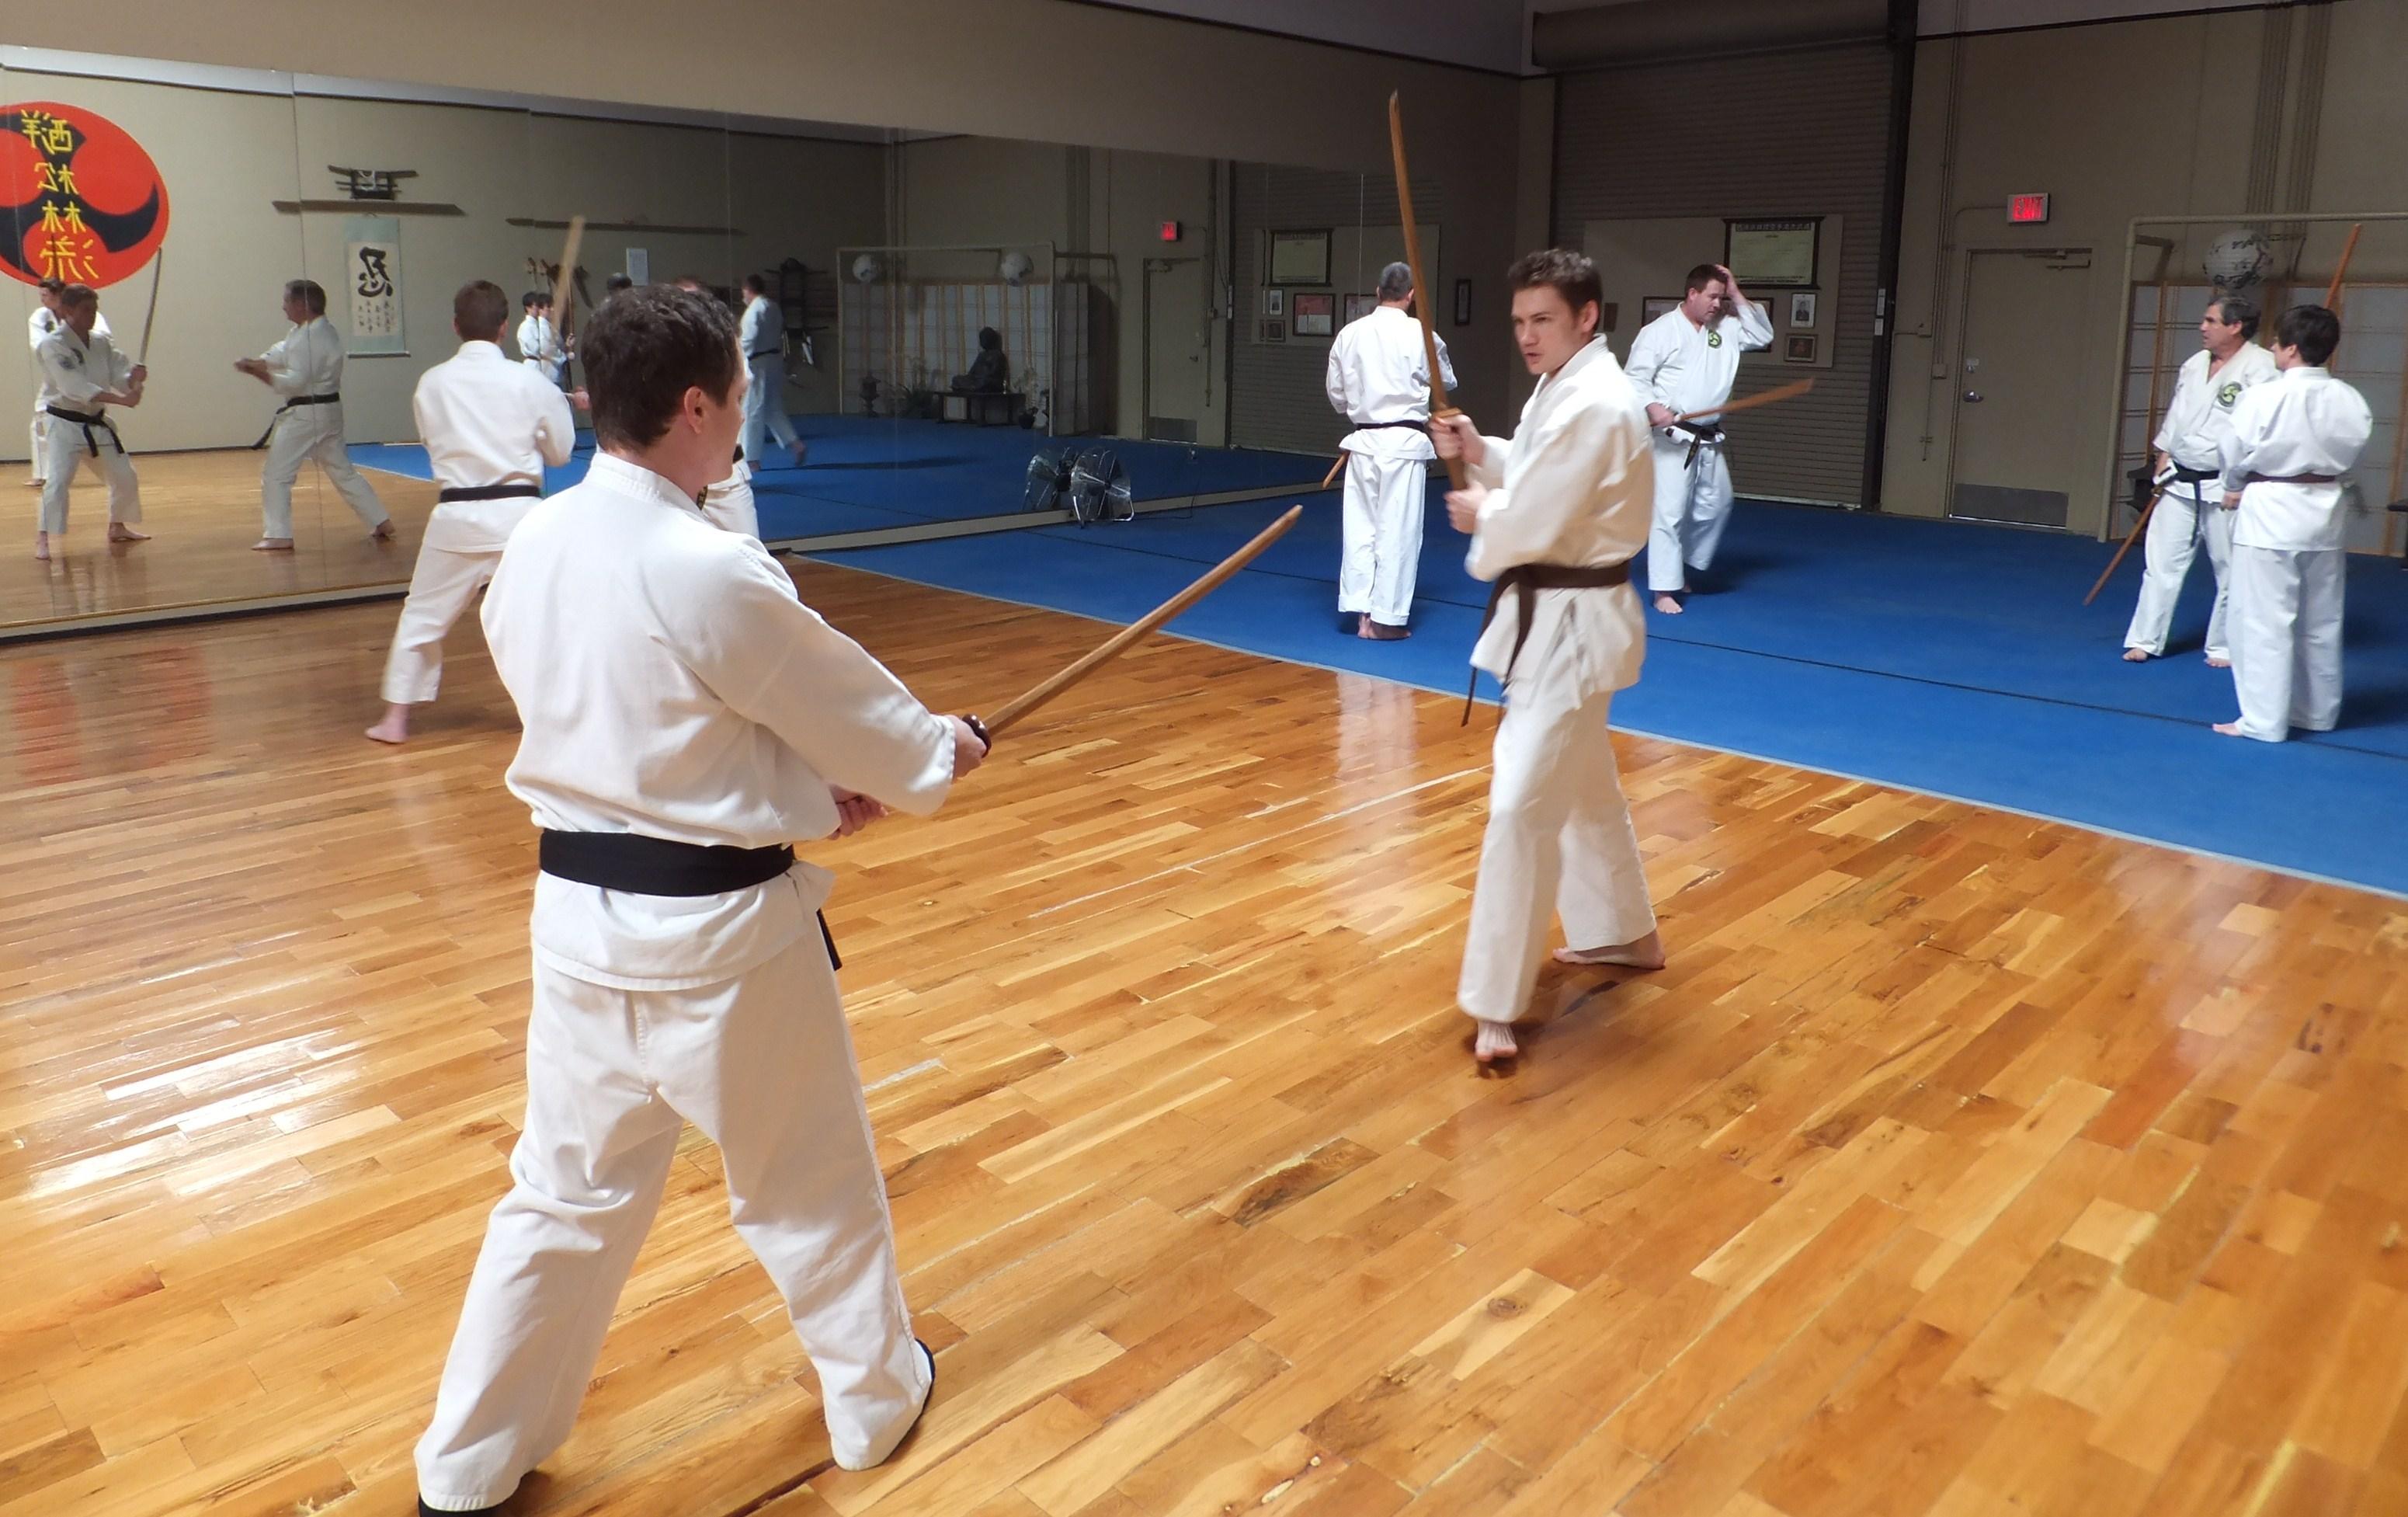 Boken (sword) training